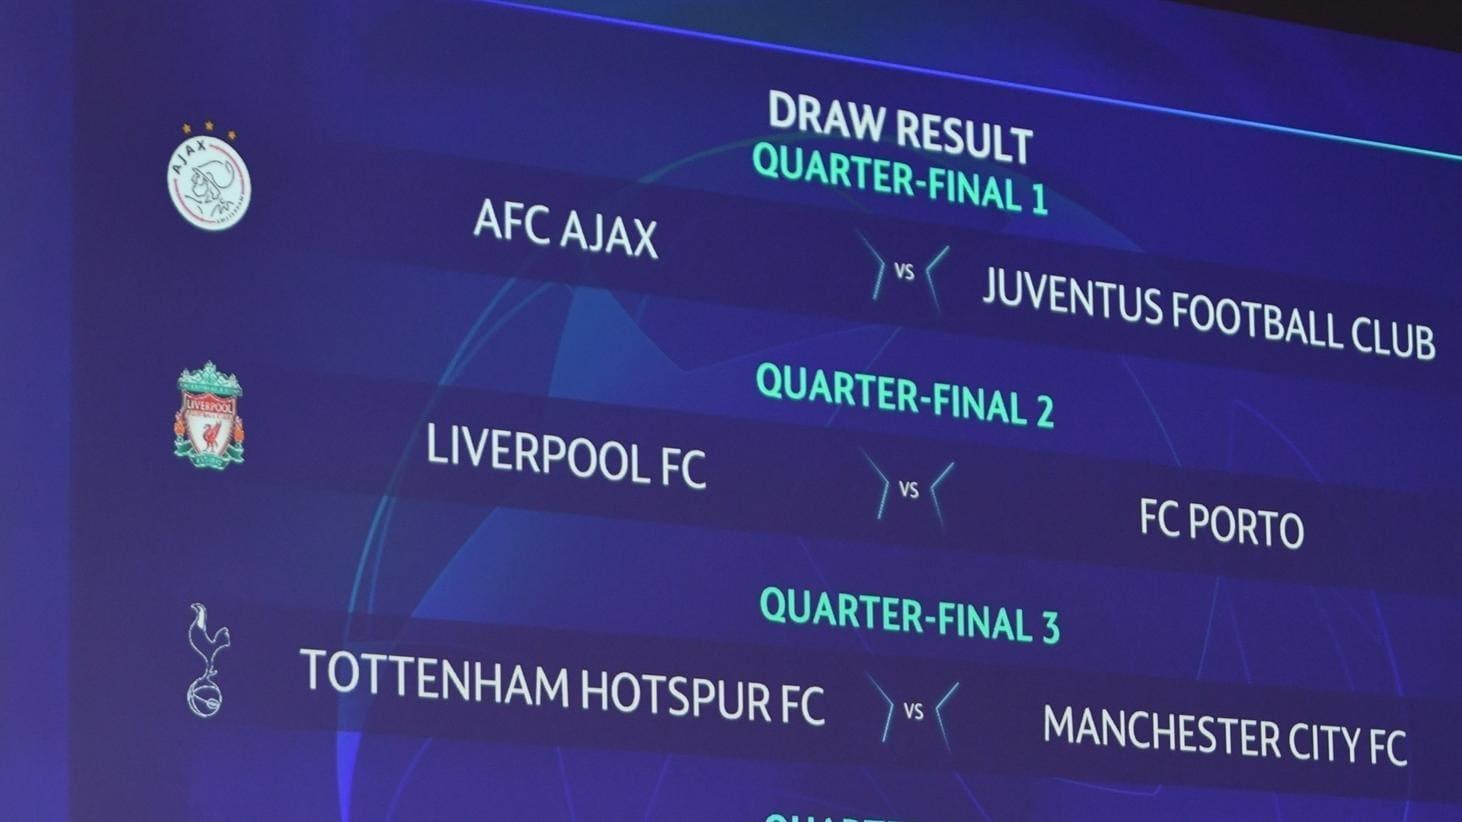 champions league quarter final and semi final draws uefa champions league uefa com champions league quarter final and semi